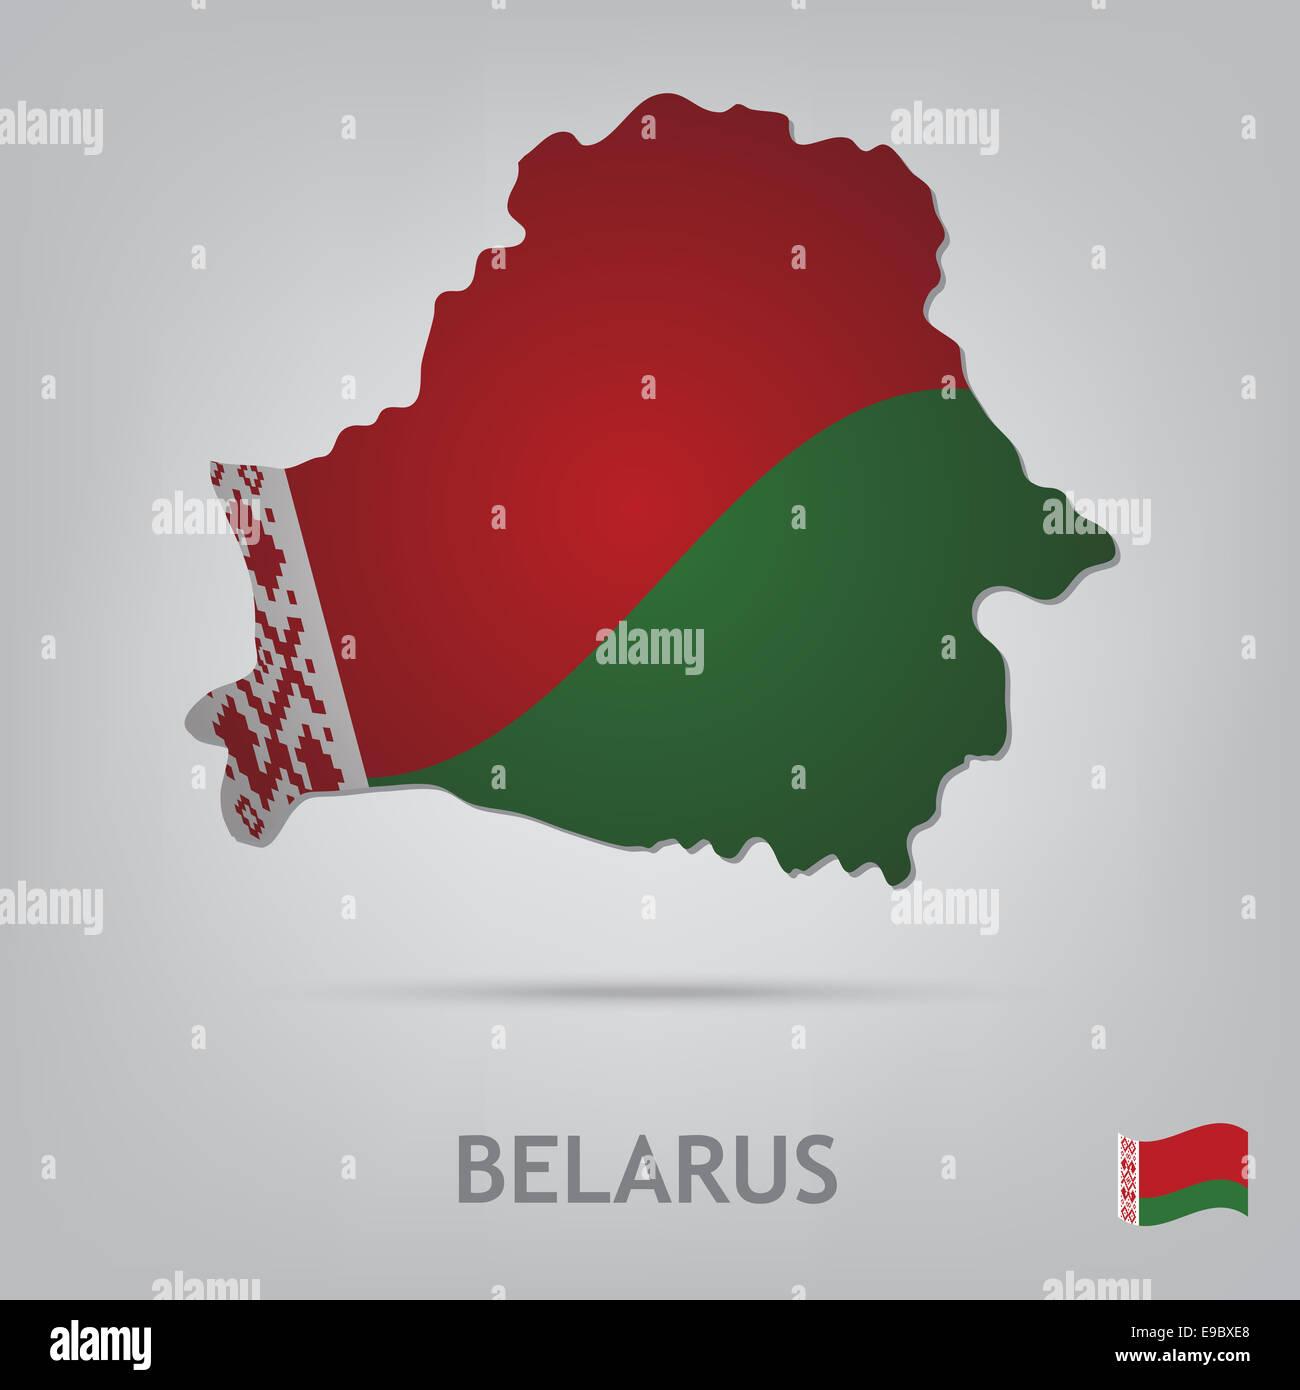 belarus - Stock Image